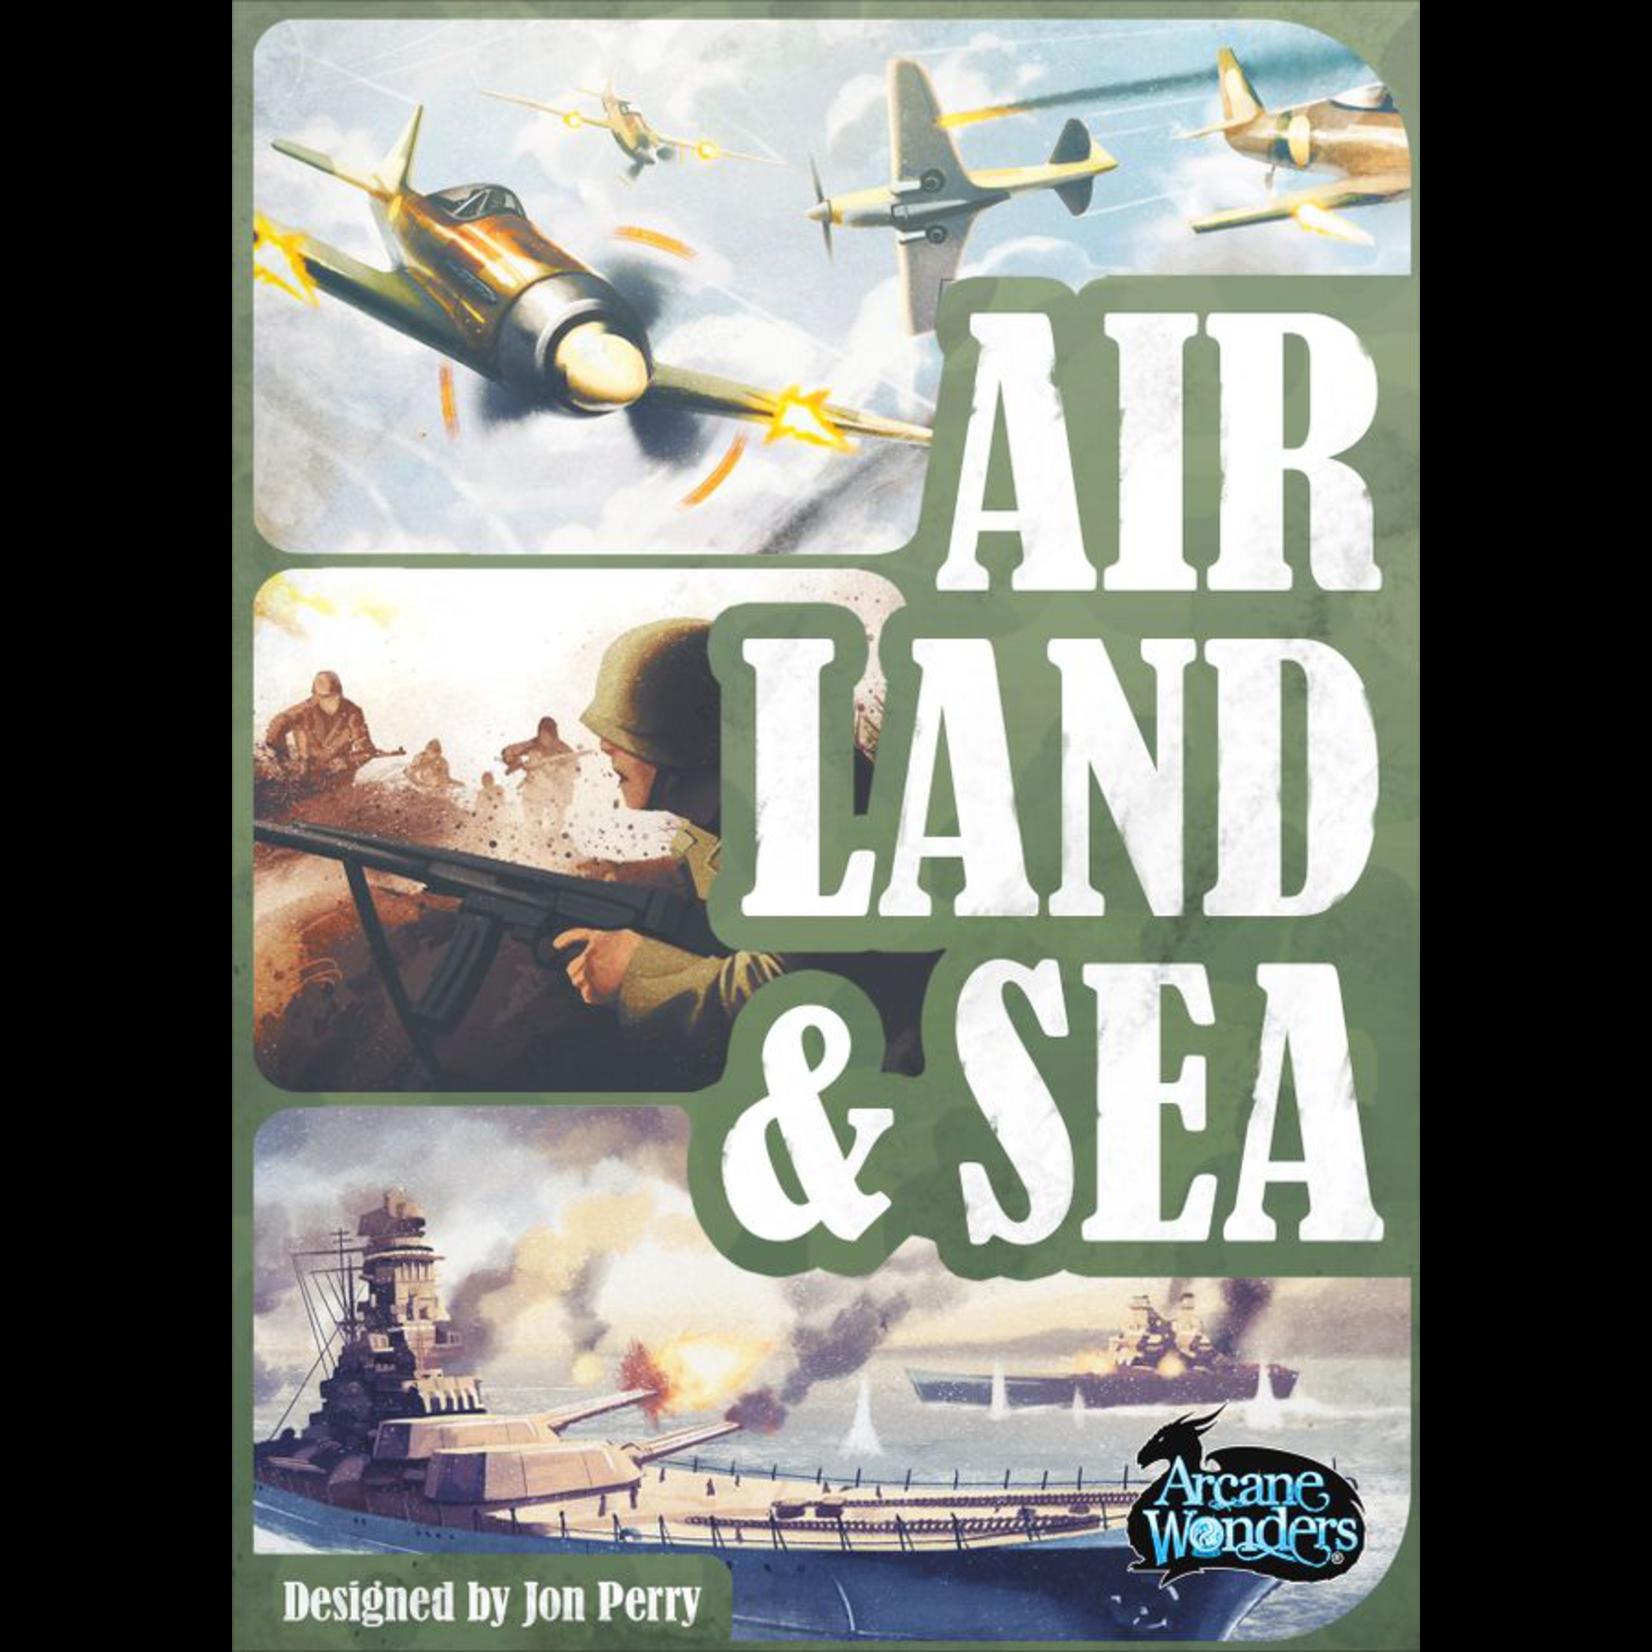 Arcane Wonders Air, Land & Sea